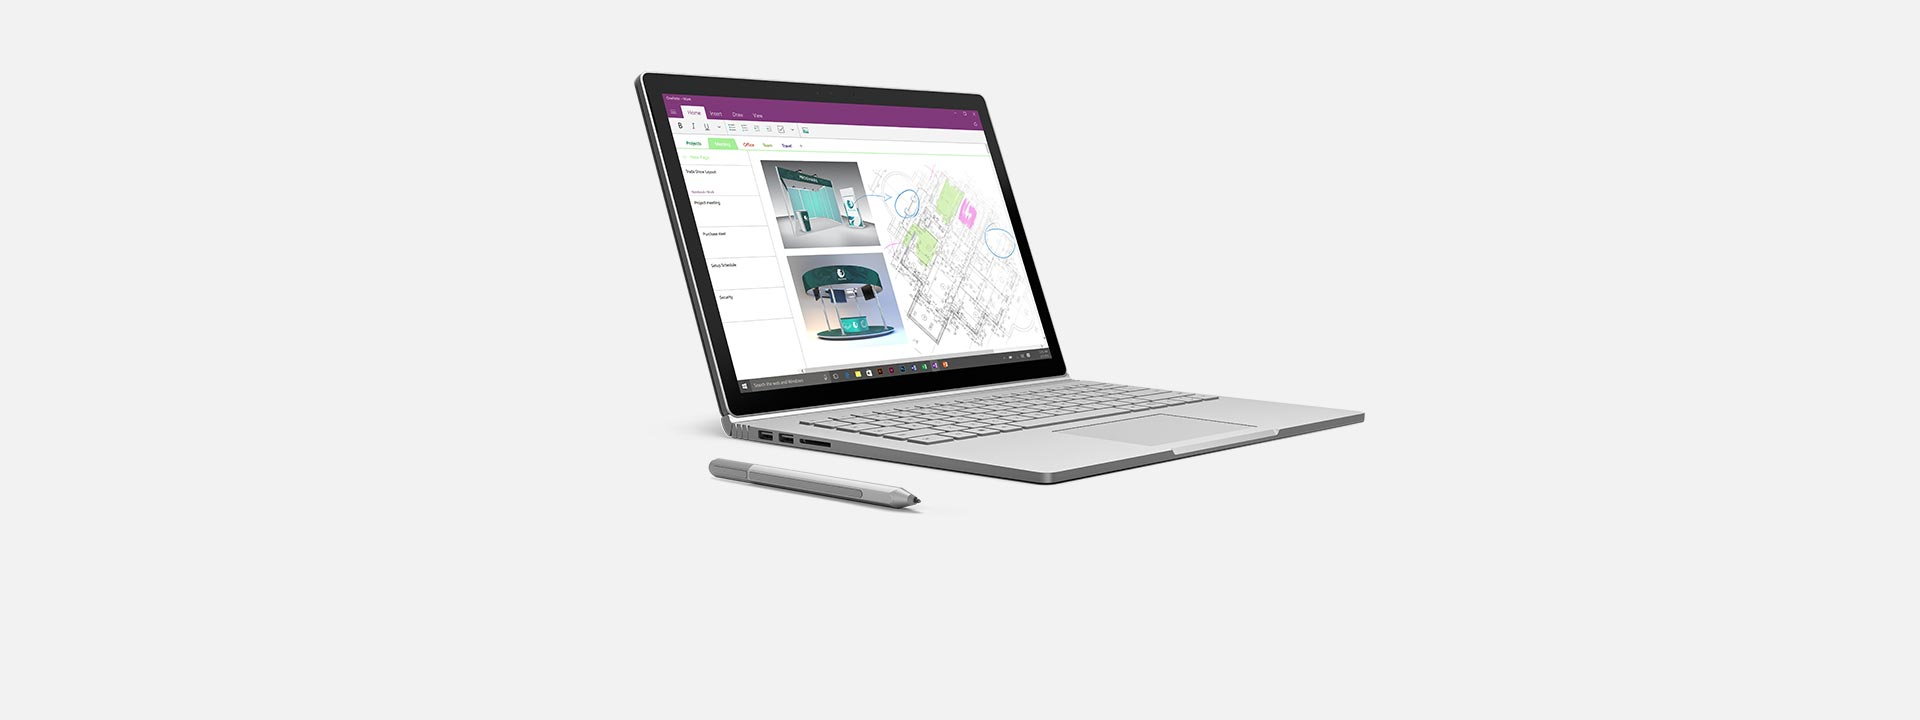 Surface Book,了解更多信息